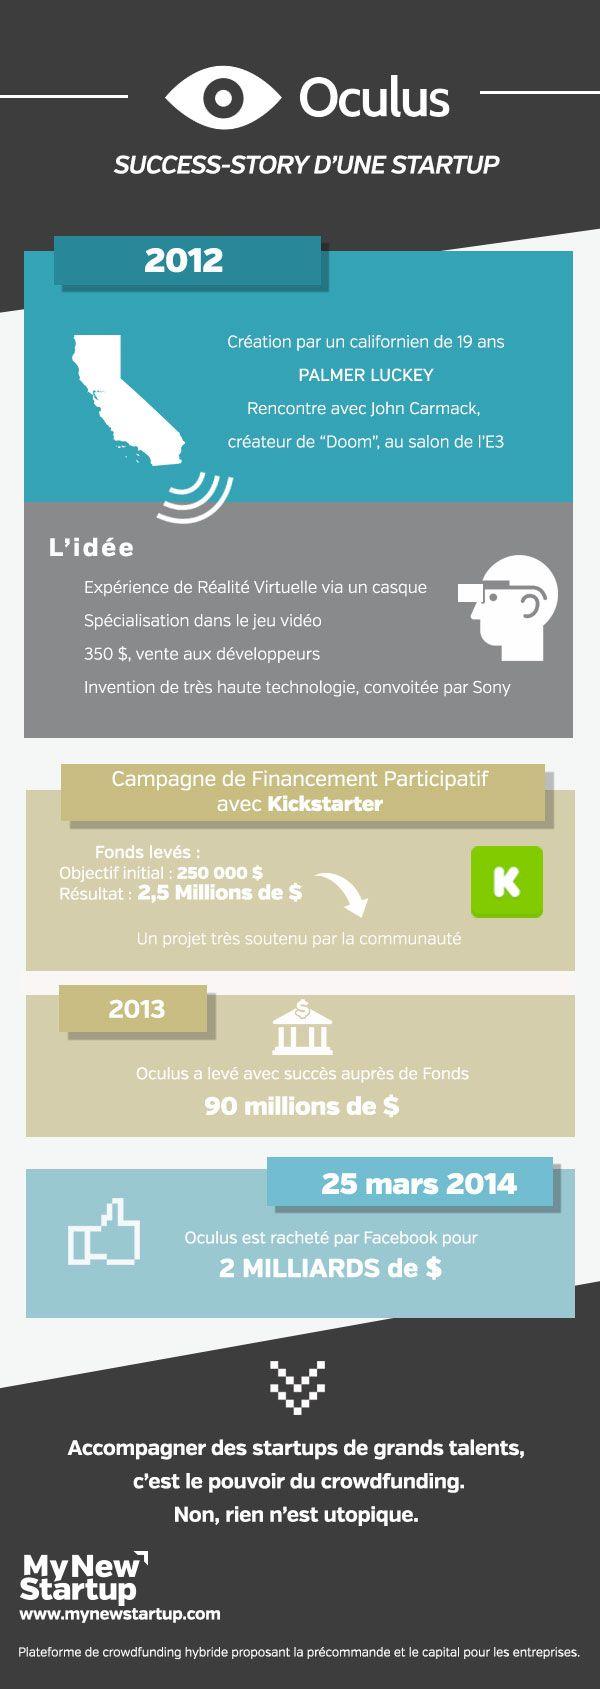 #Oculus : success story d'une #startup grâce au #crowdfunding